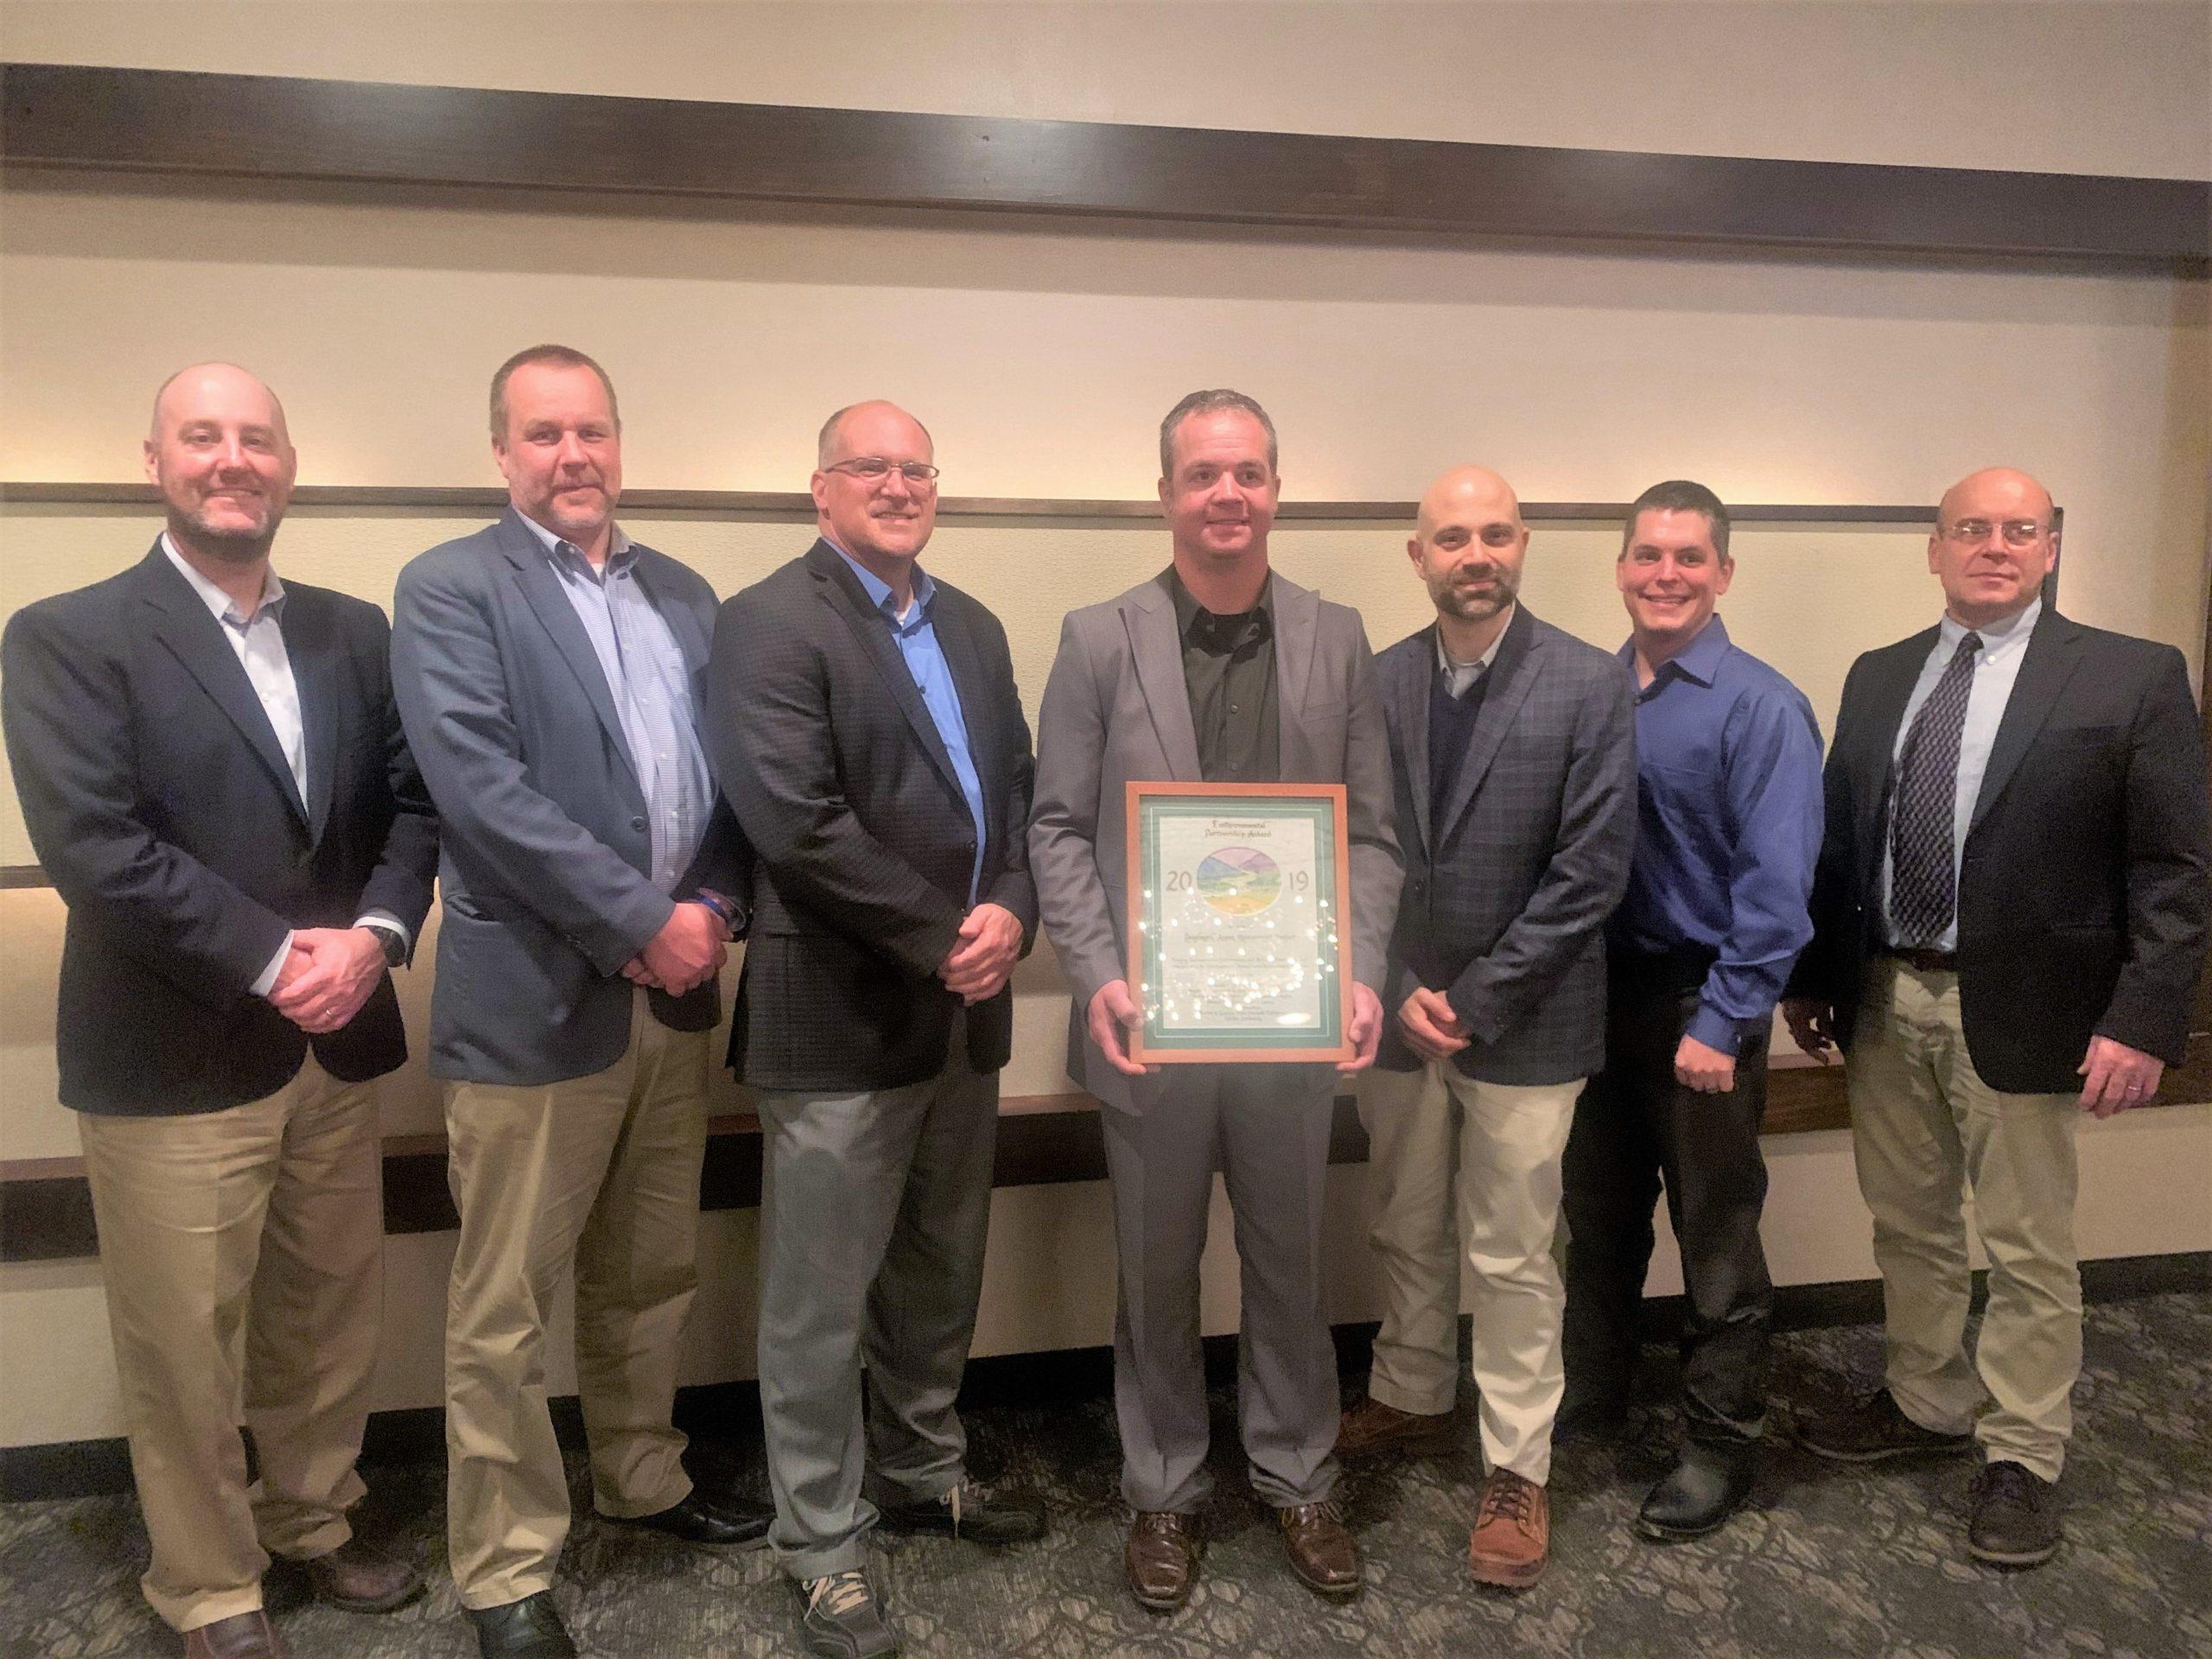 Energy Transfer Receives Enviornmental Partnership Award for Wildlife Habitat Project in Pennsylvania